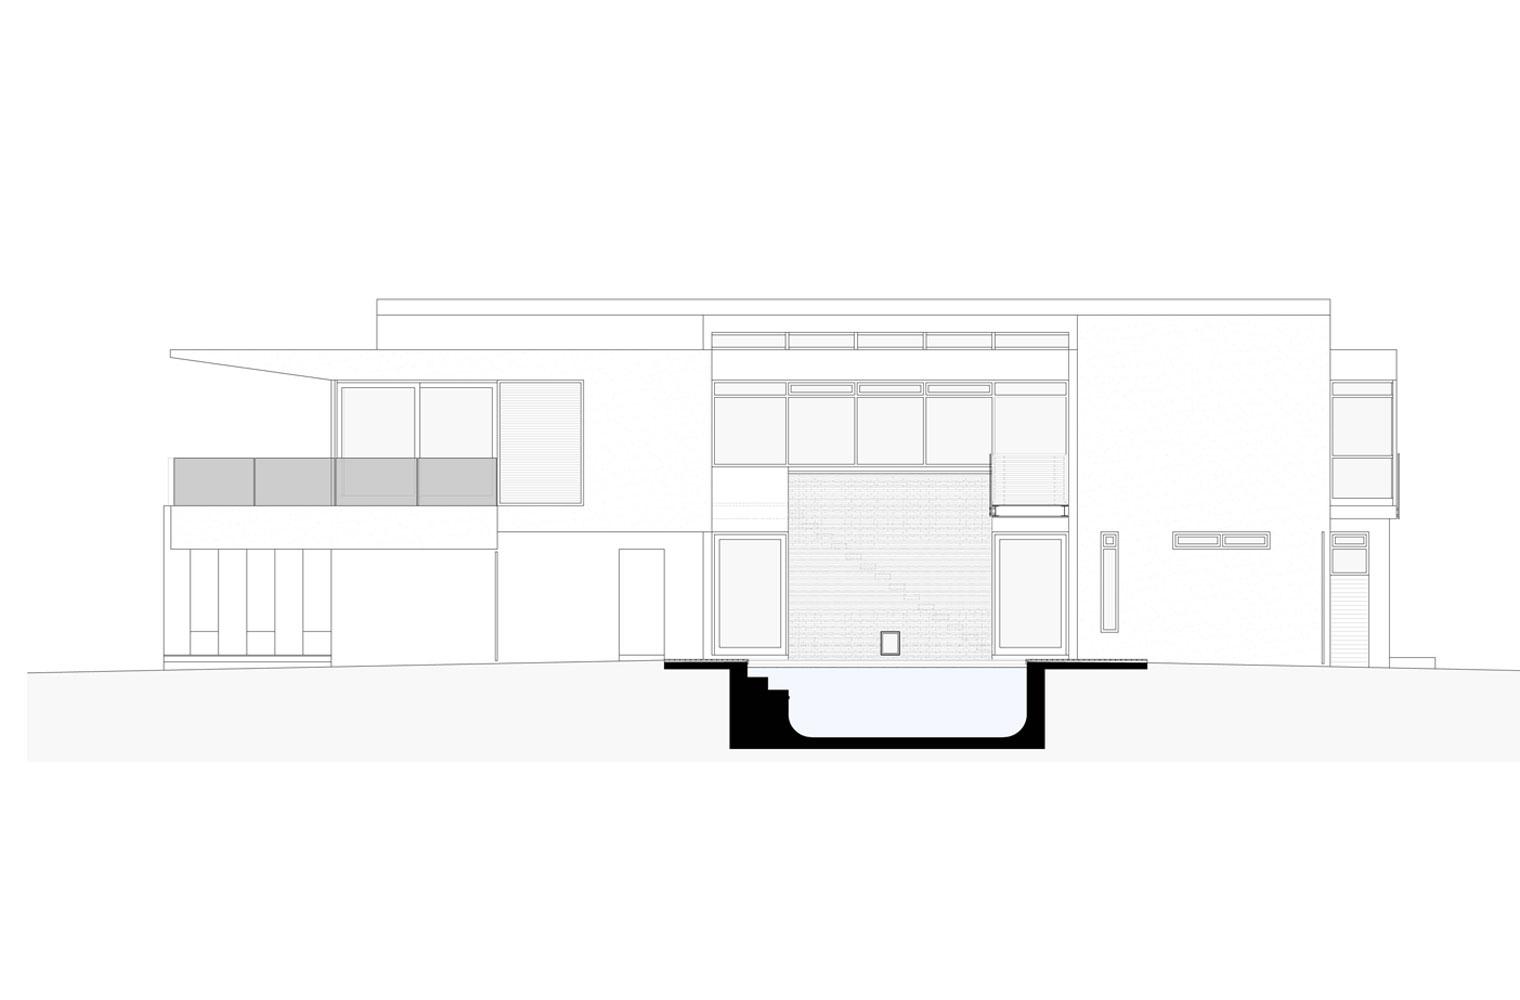 Langbaai House - South Elevation